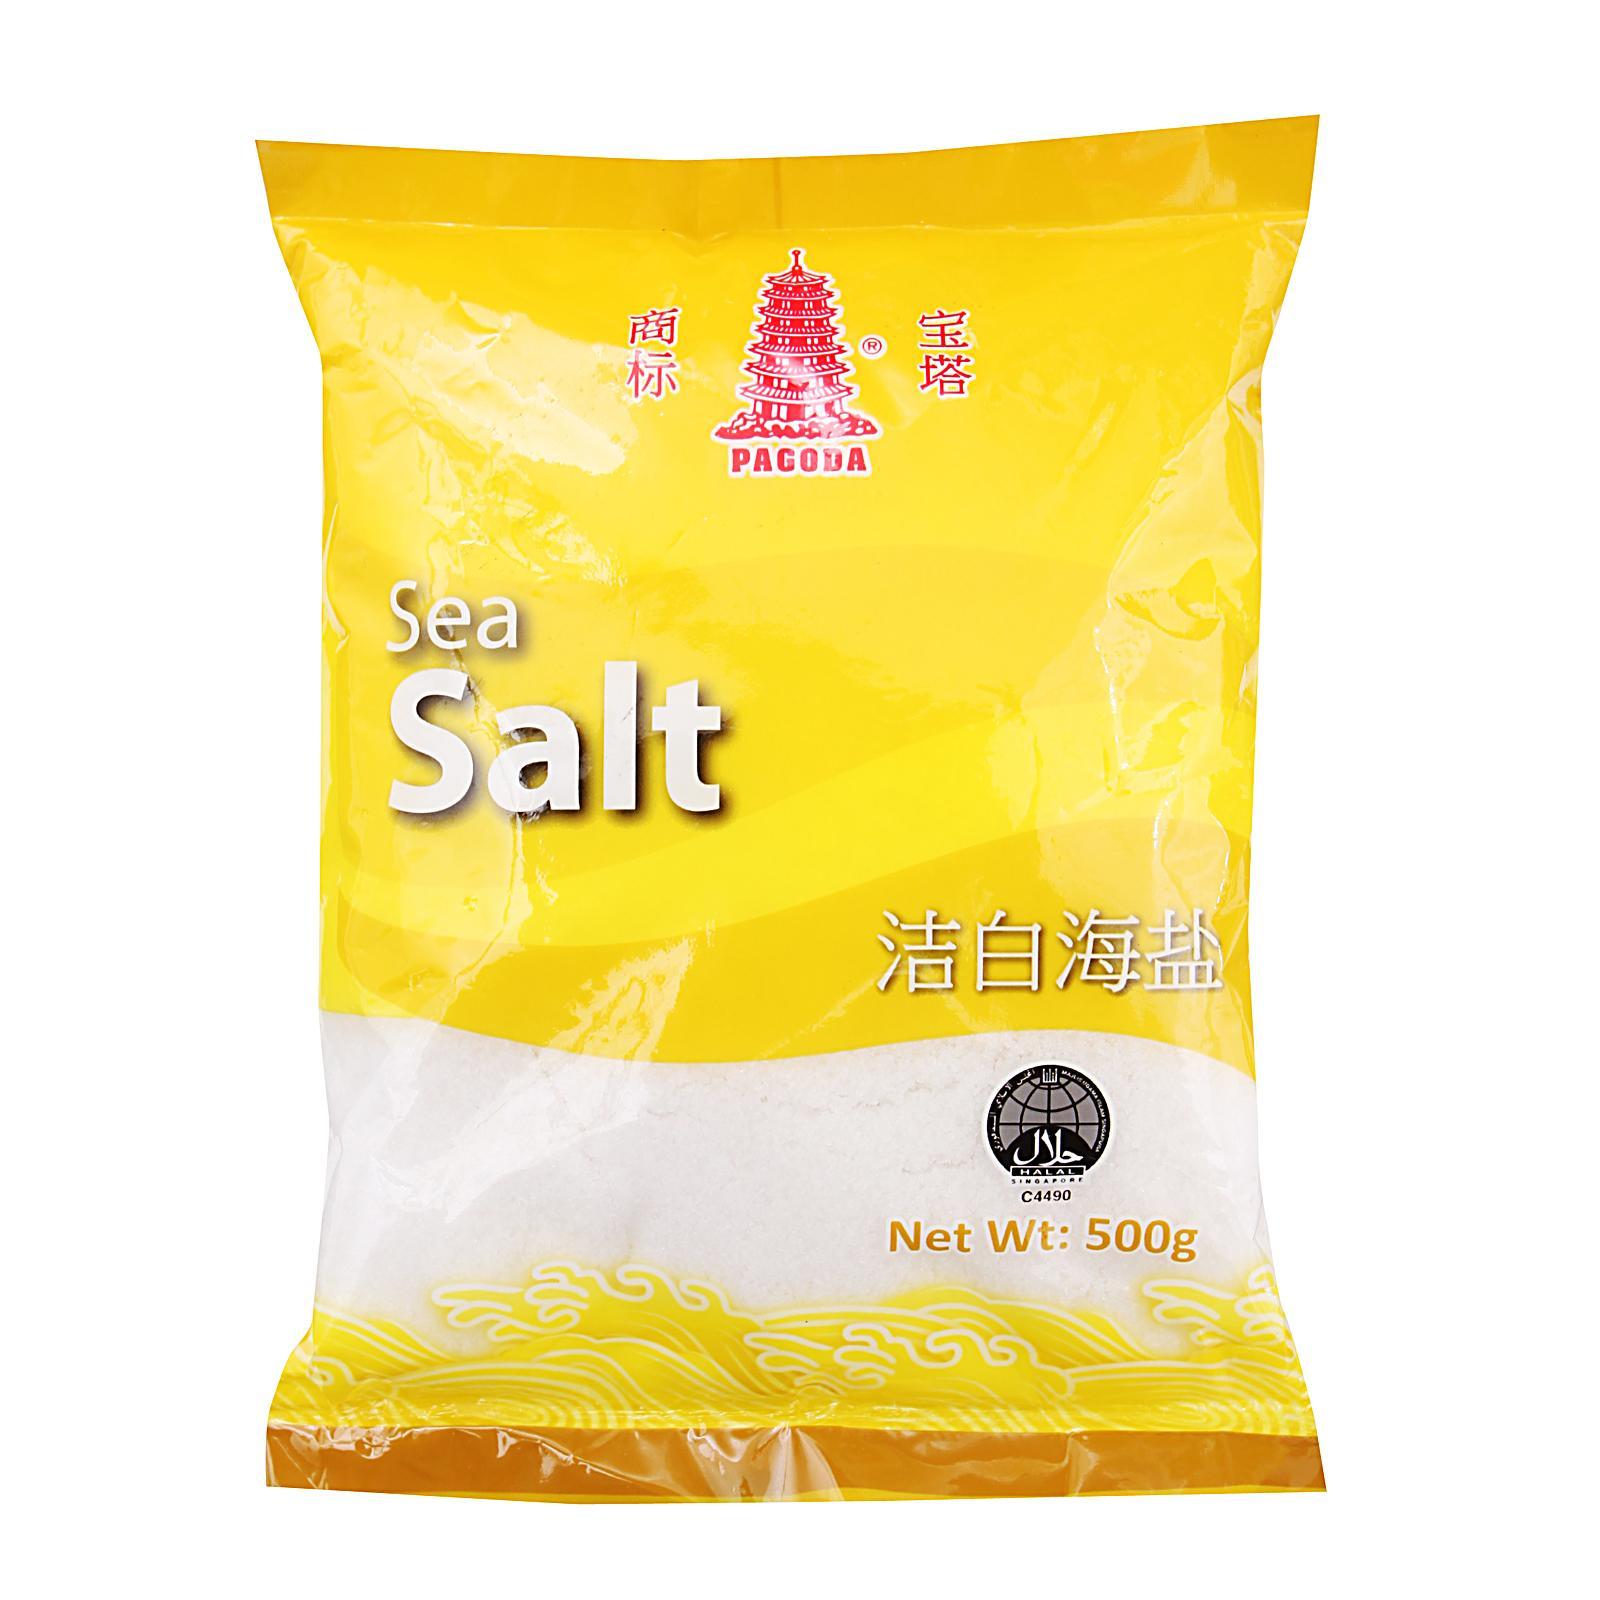 Pagoda Sea Salt 500G